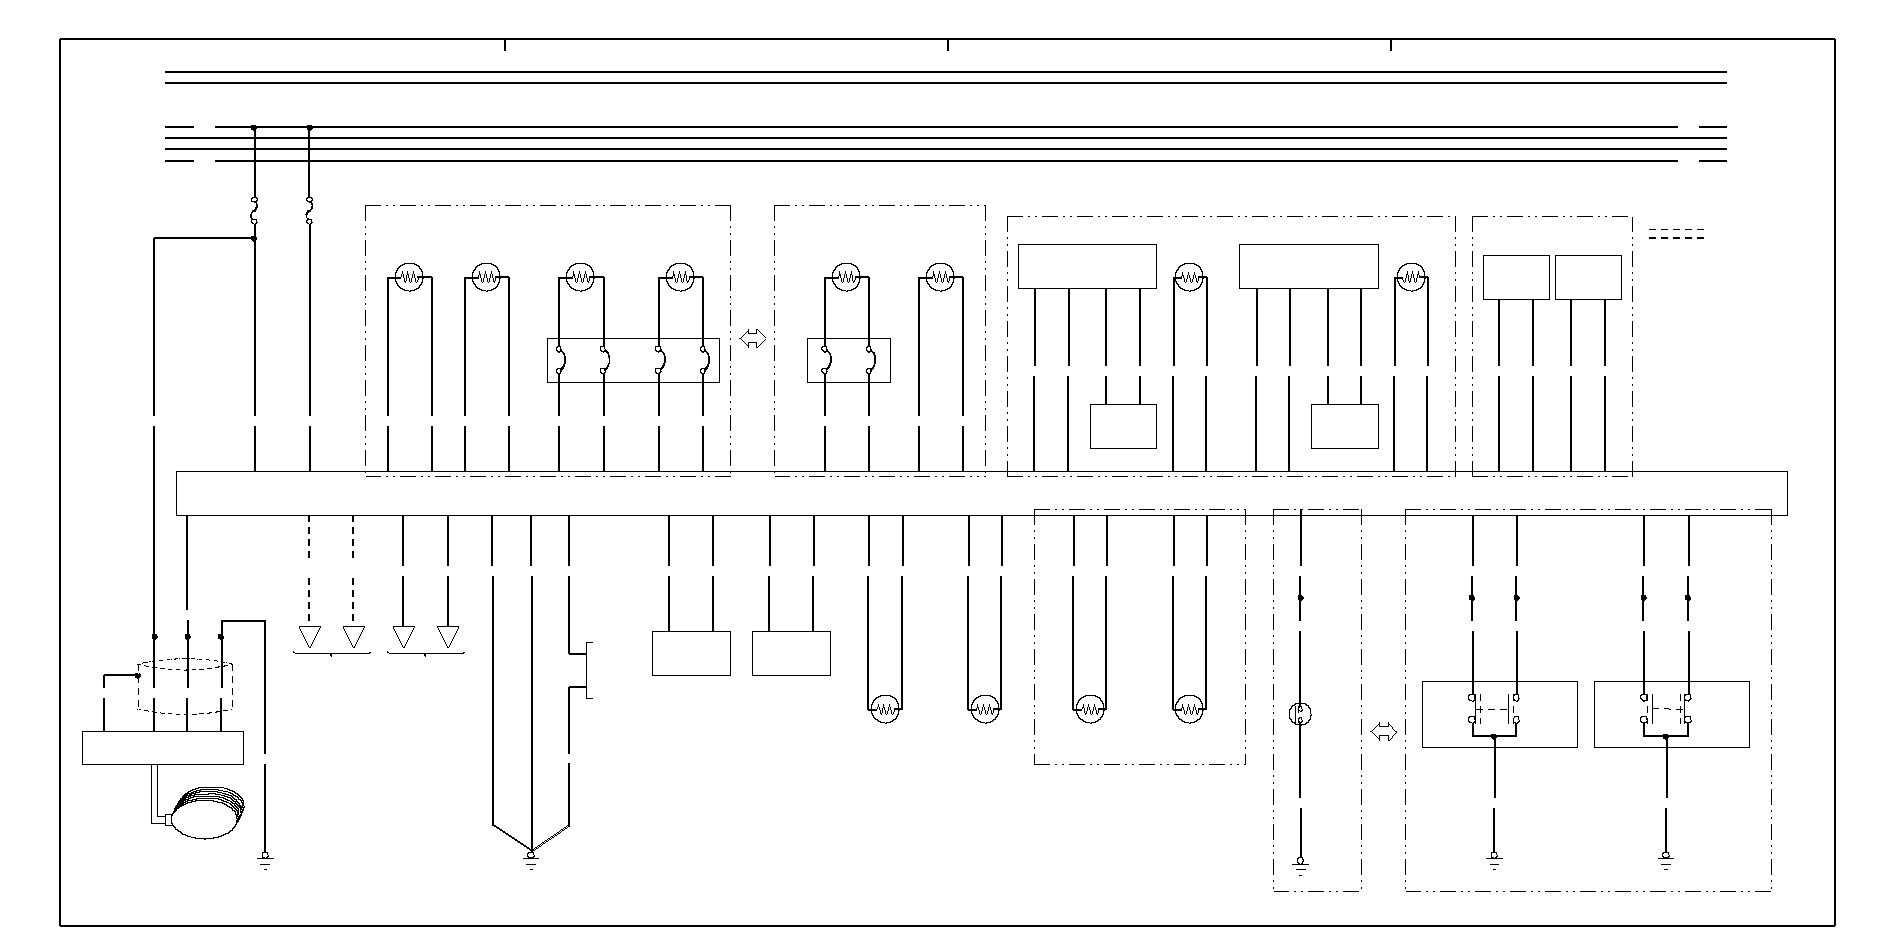 wiring diagram for honda jazz